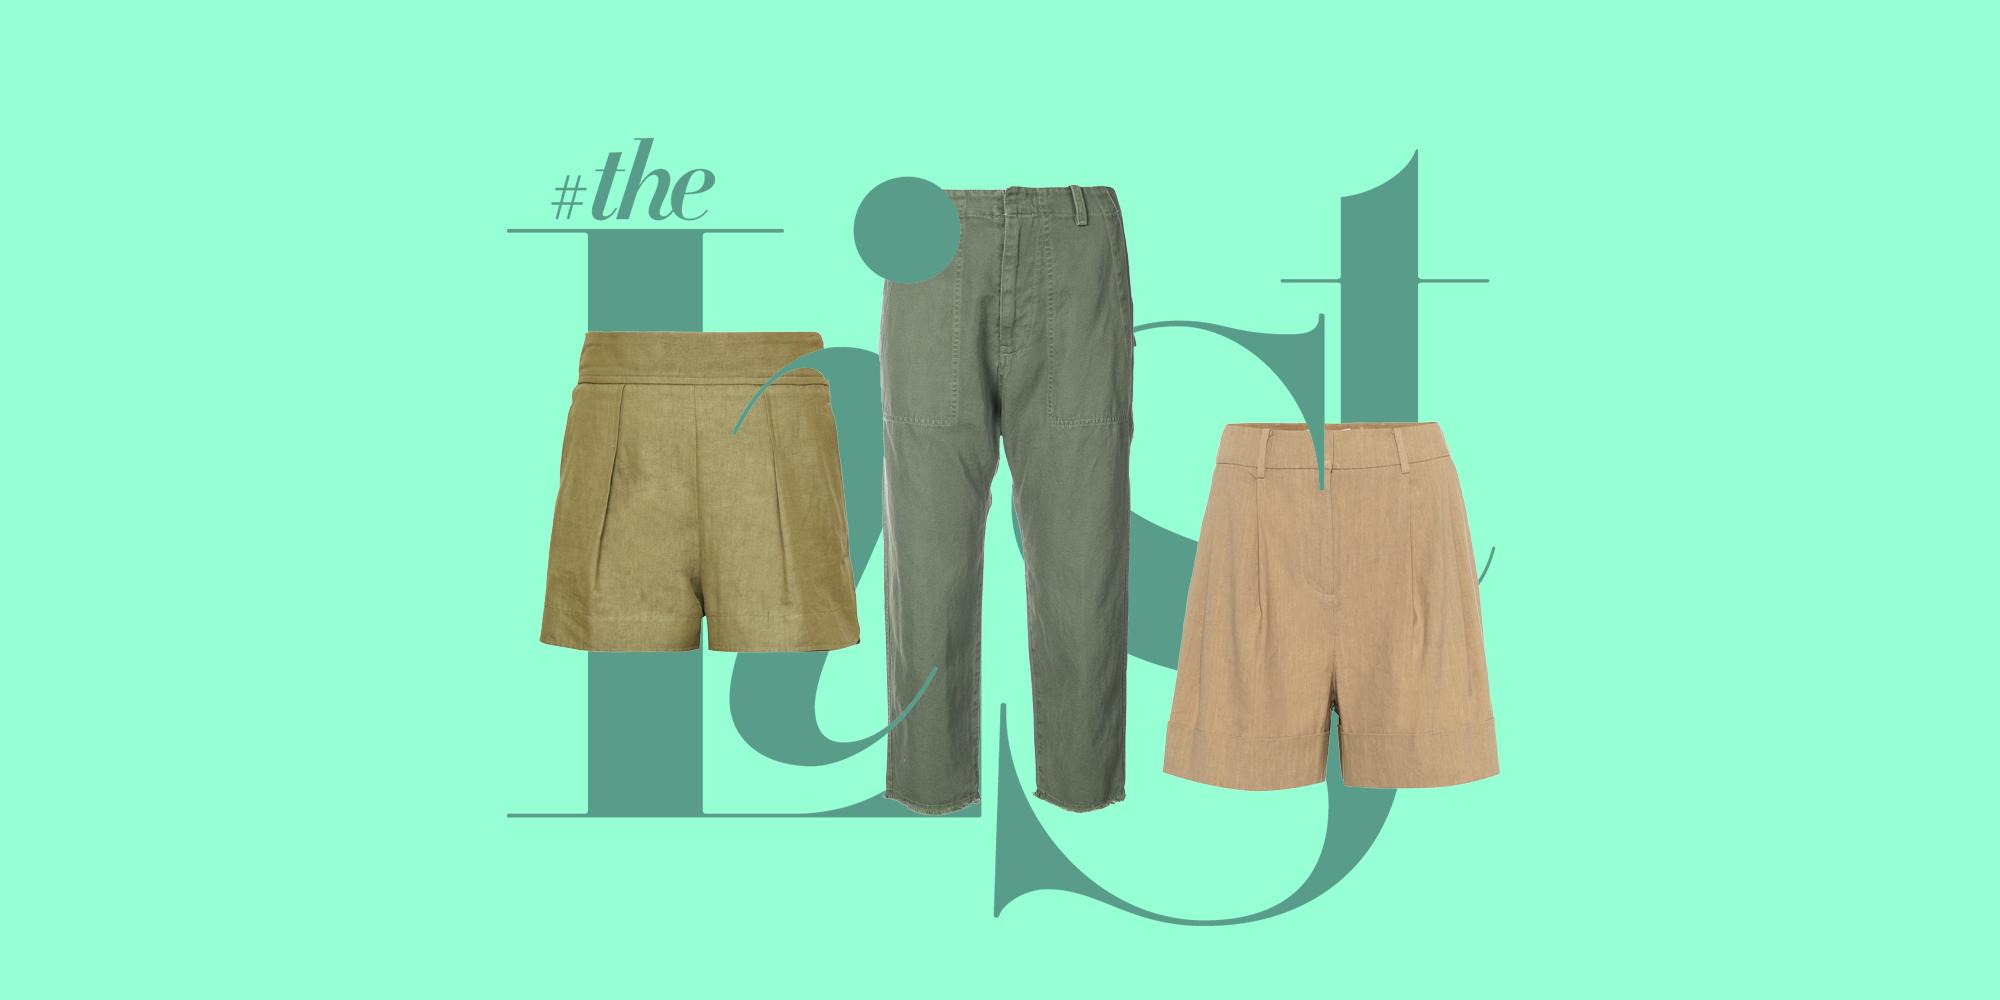 I pantaloni di lino per l'Estate 2020